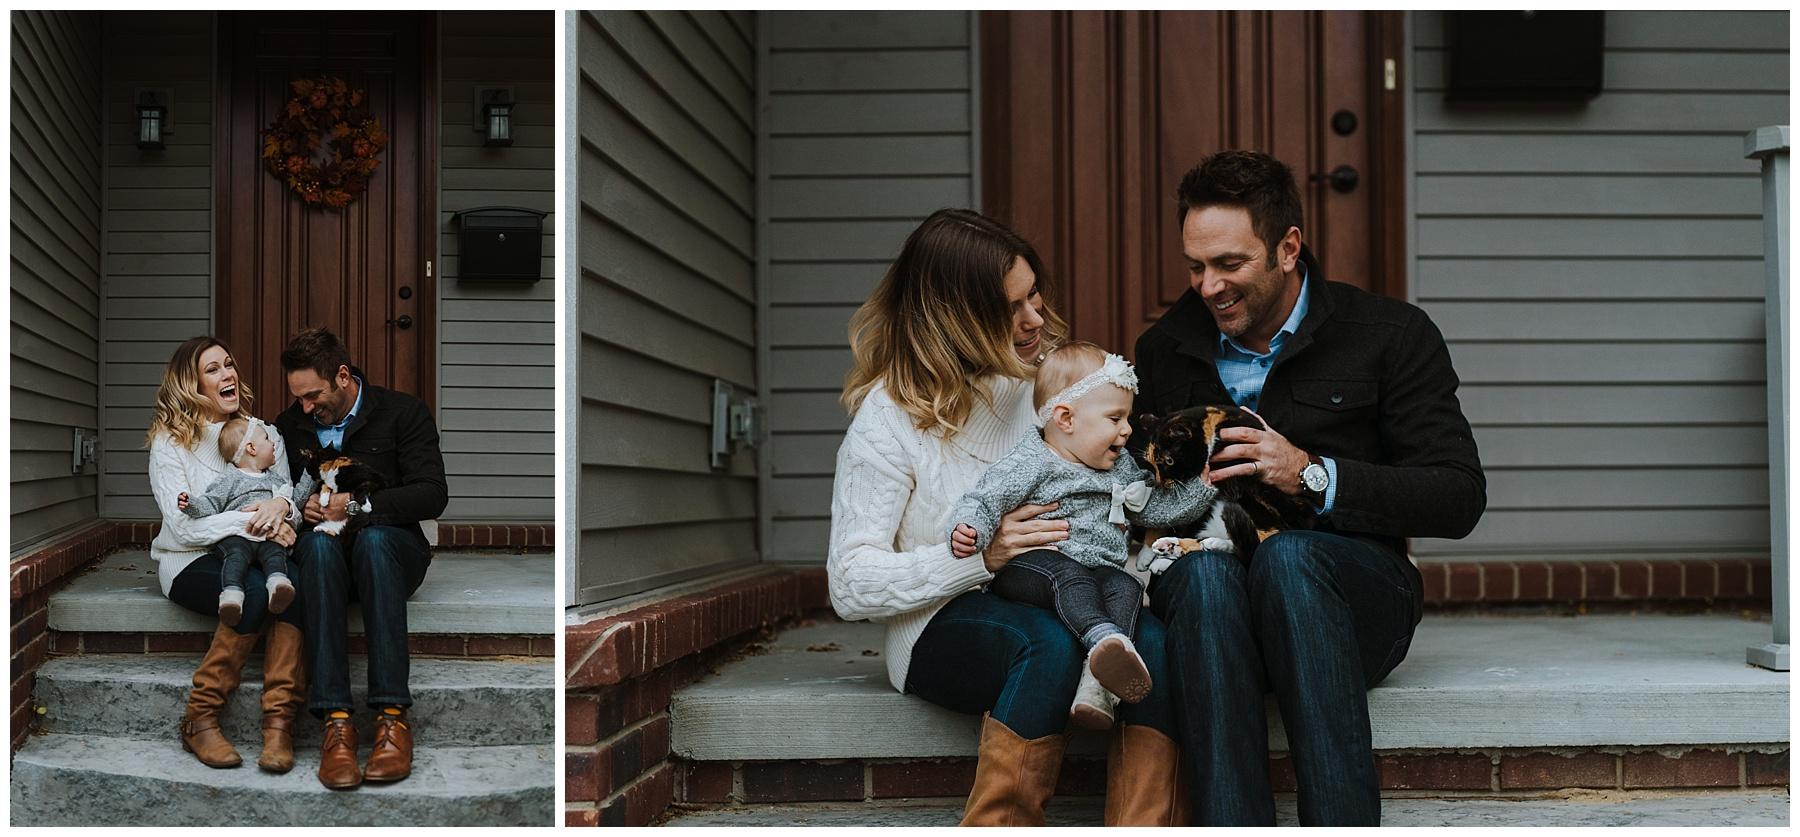 Royal Oak Family photographer